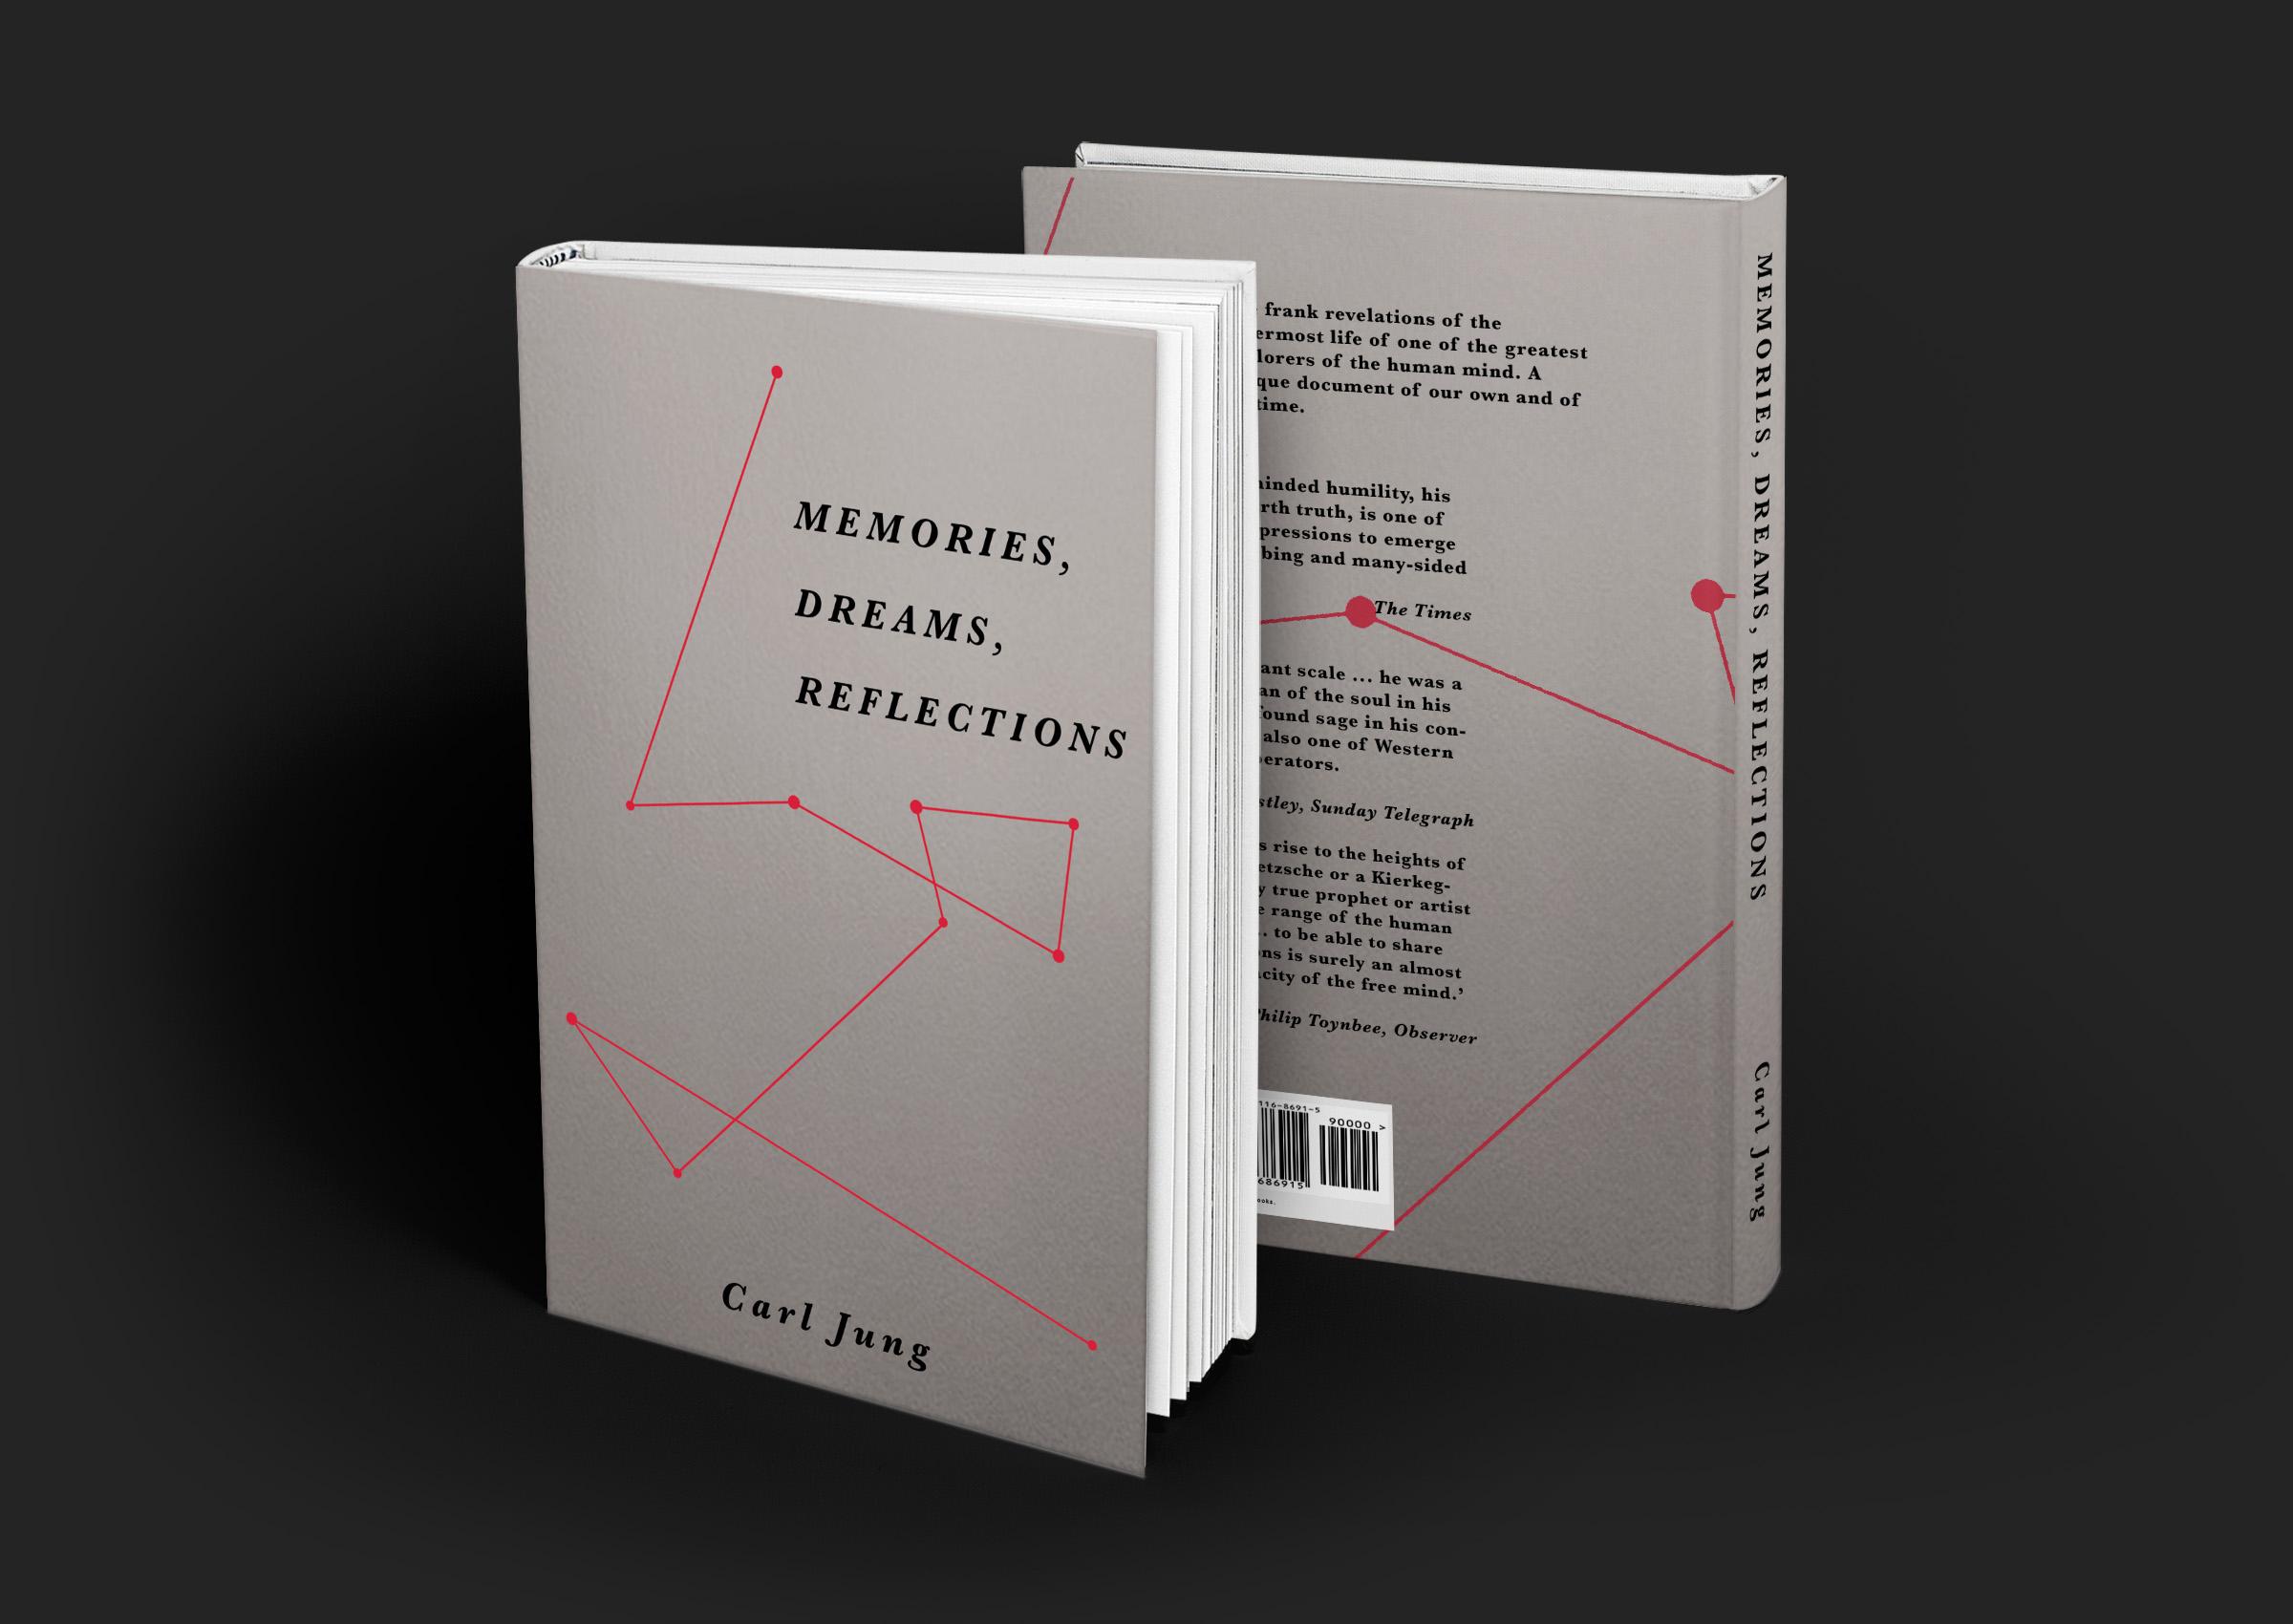 carl jung book cover.jpg